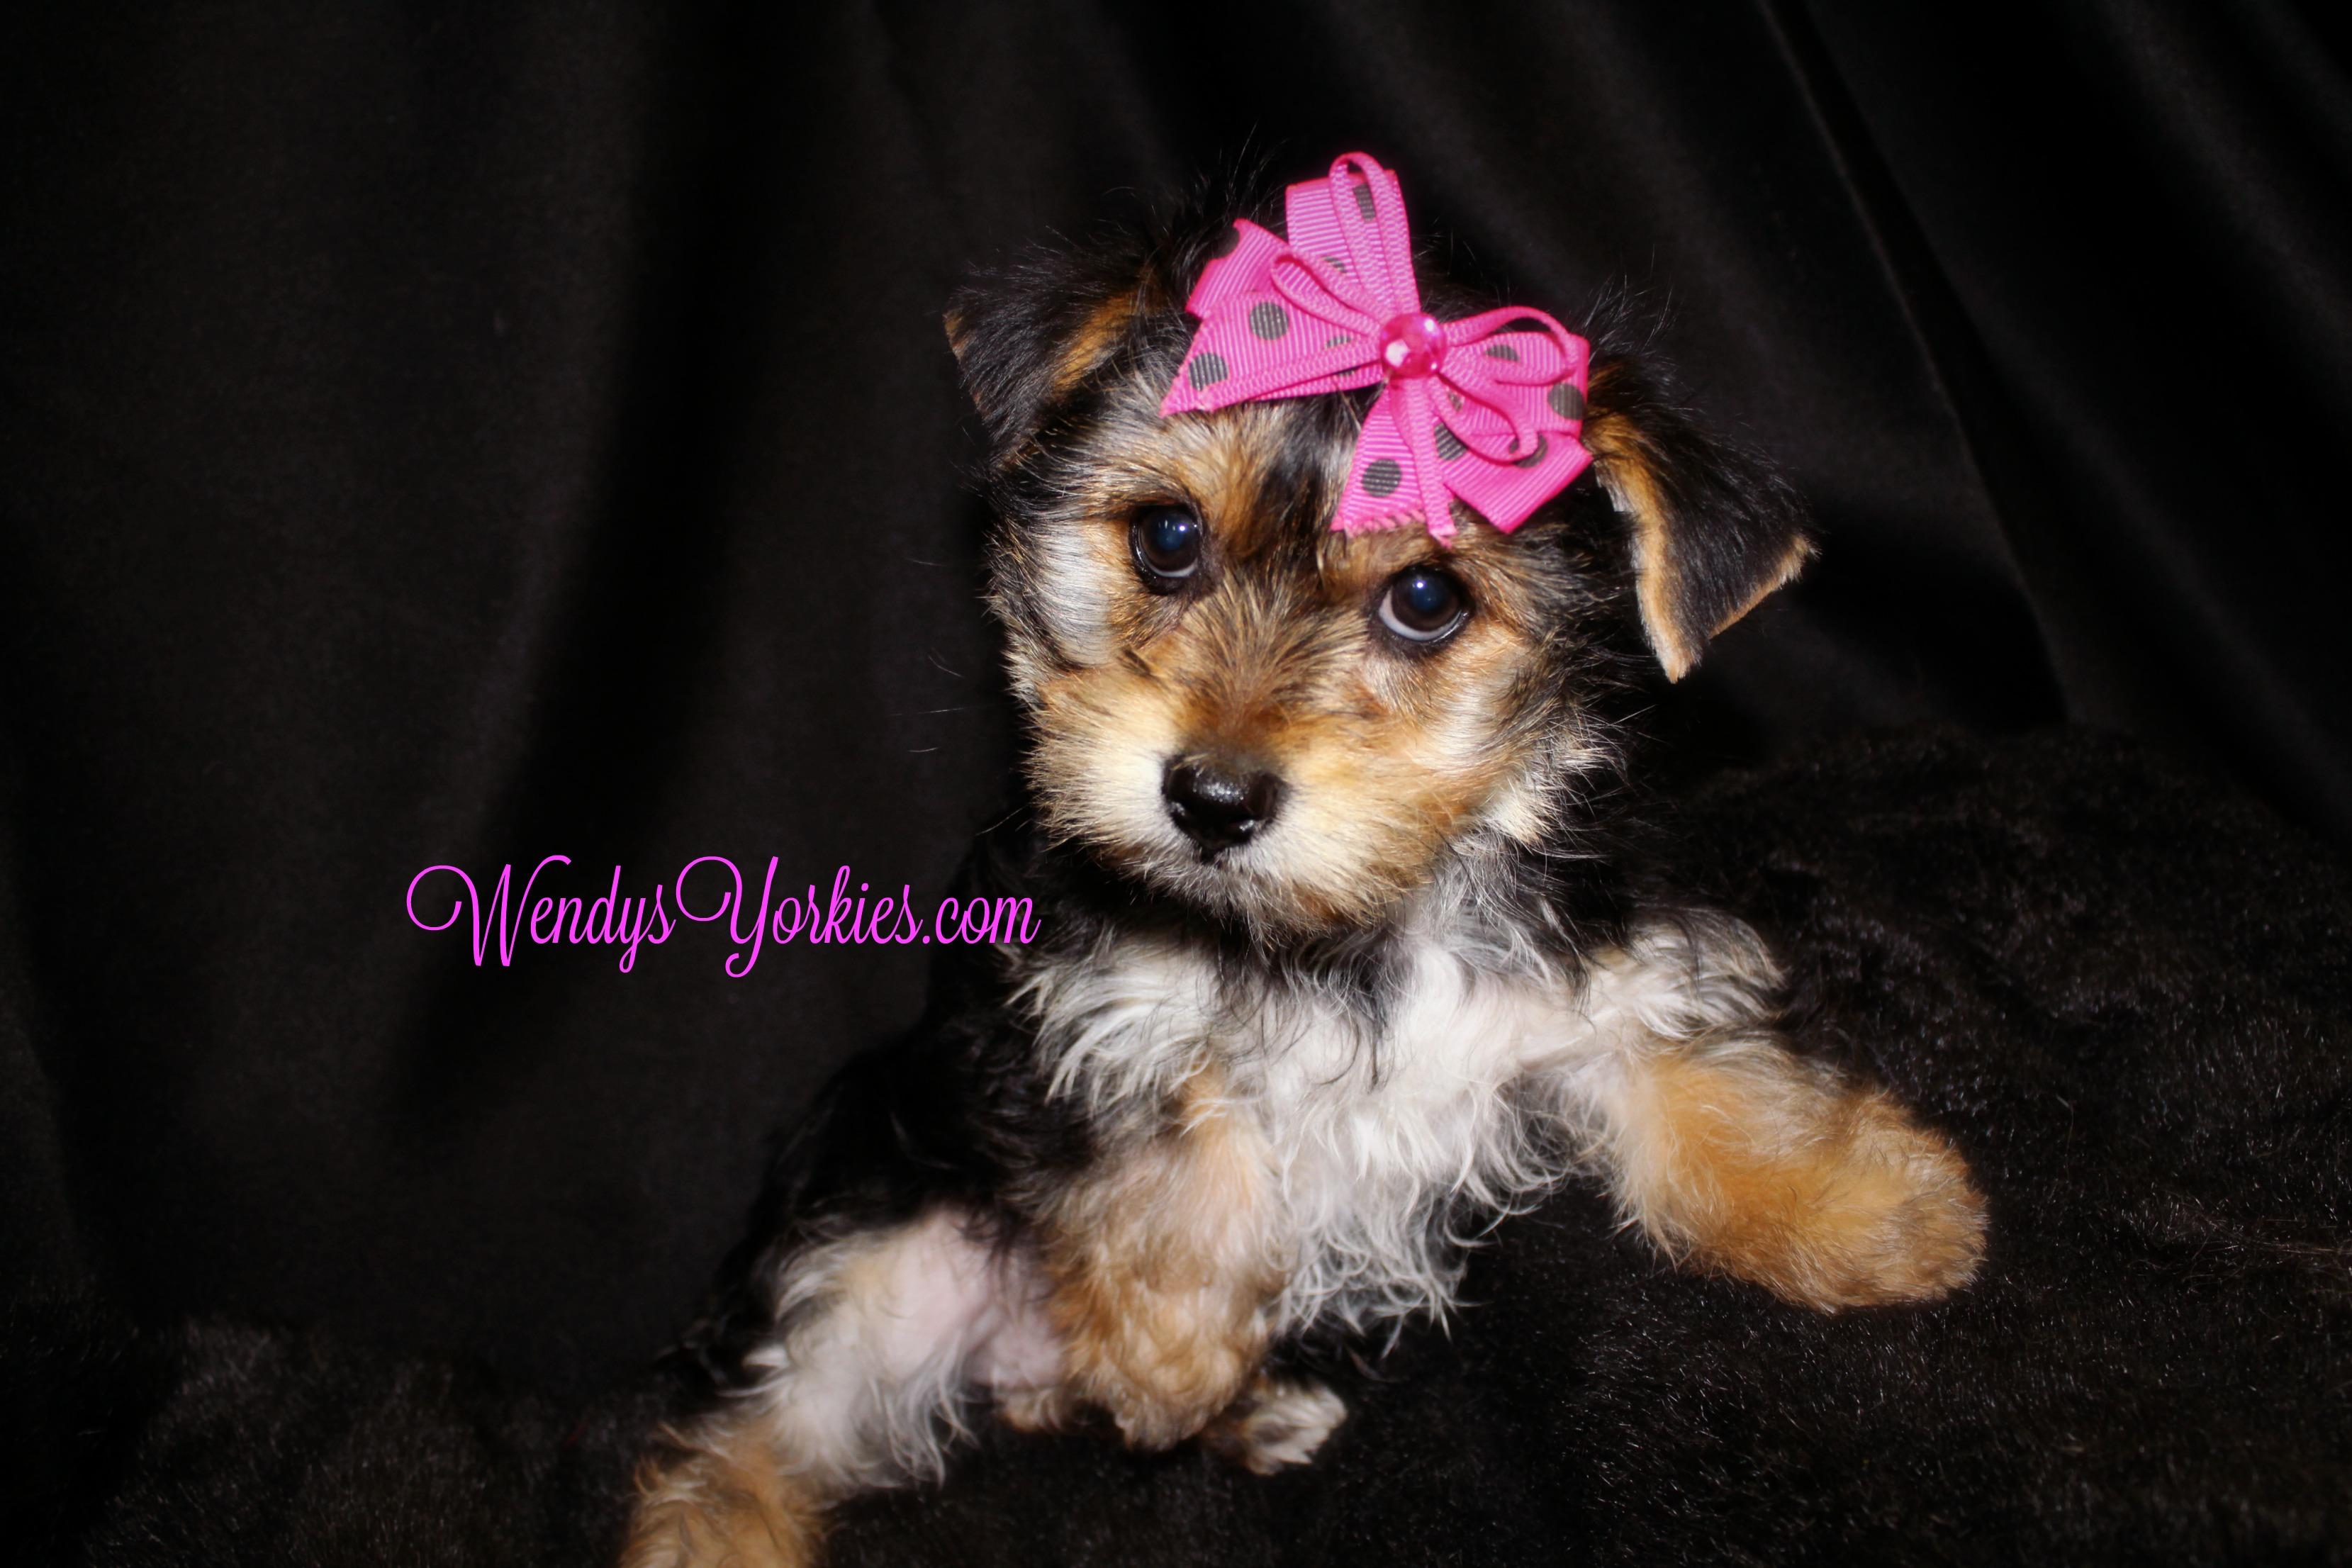 Female Yorkie puppy for sale, WendysYorkies.com, TH f